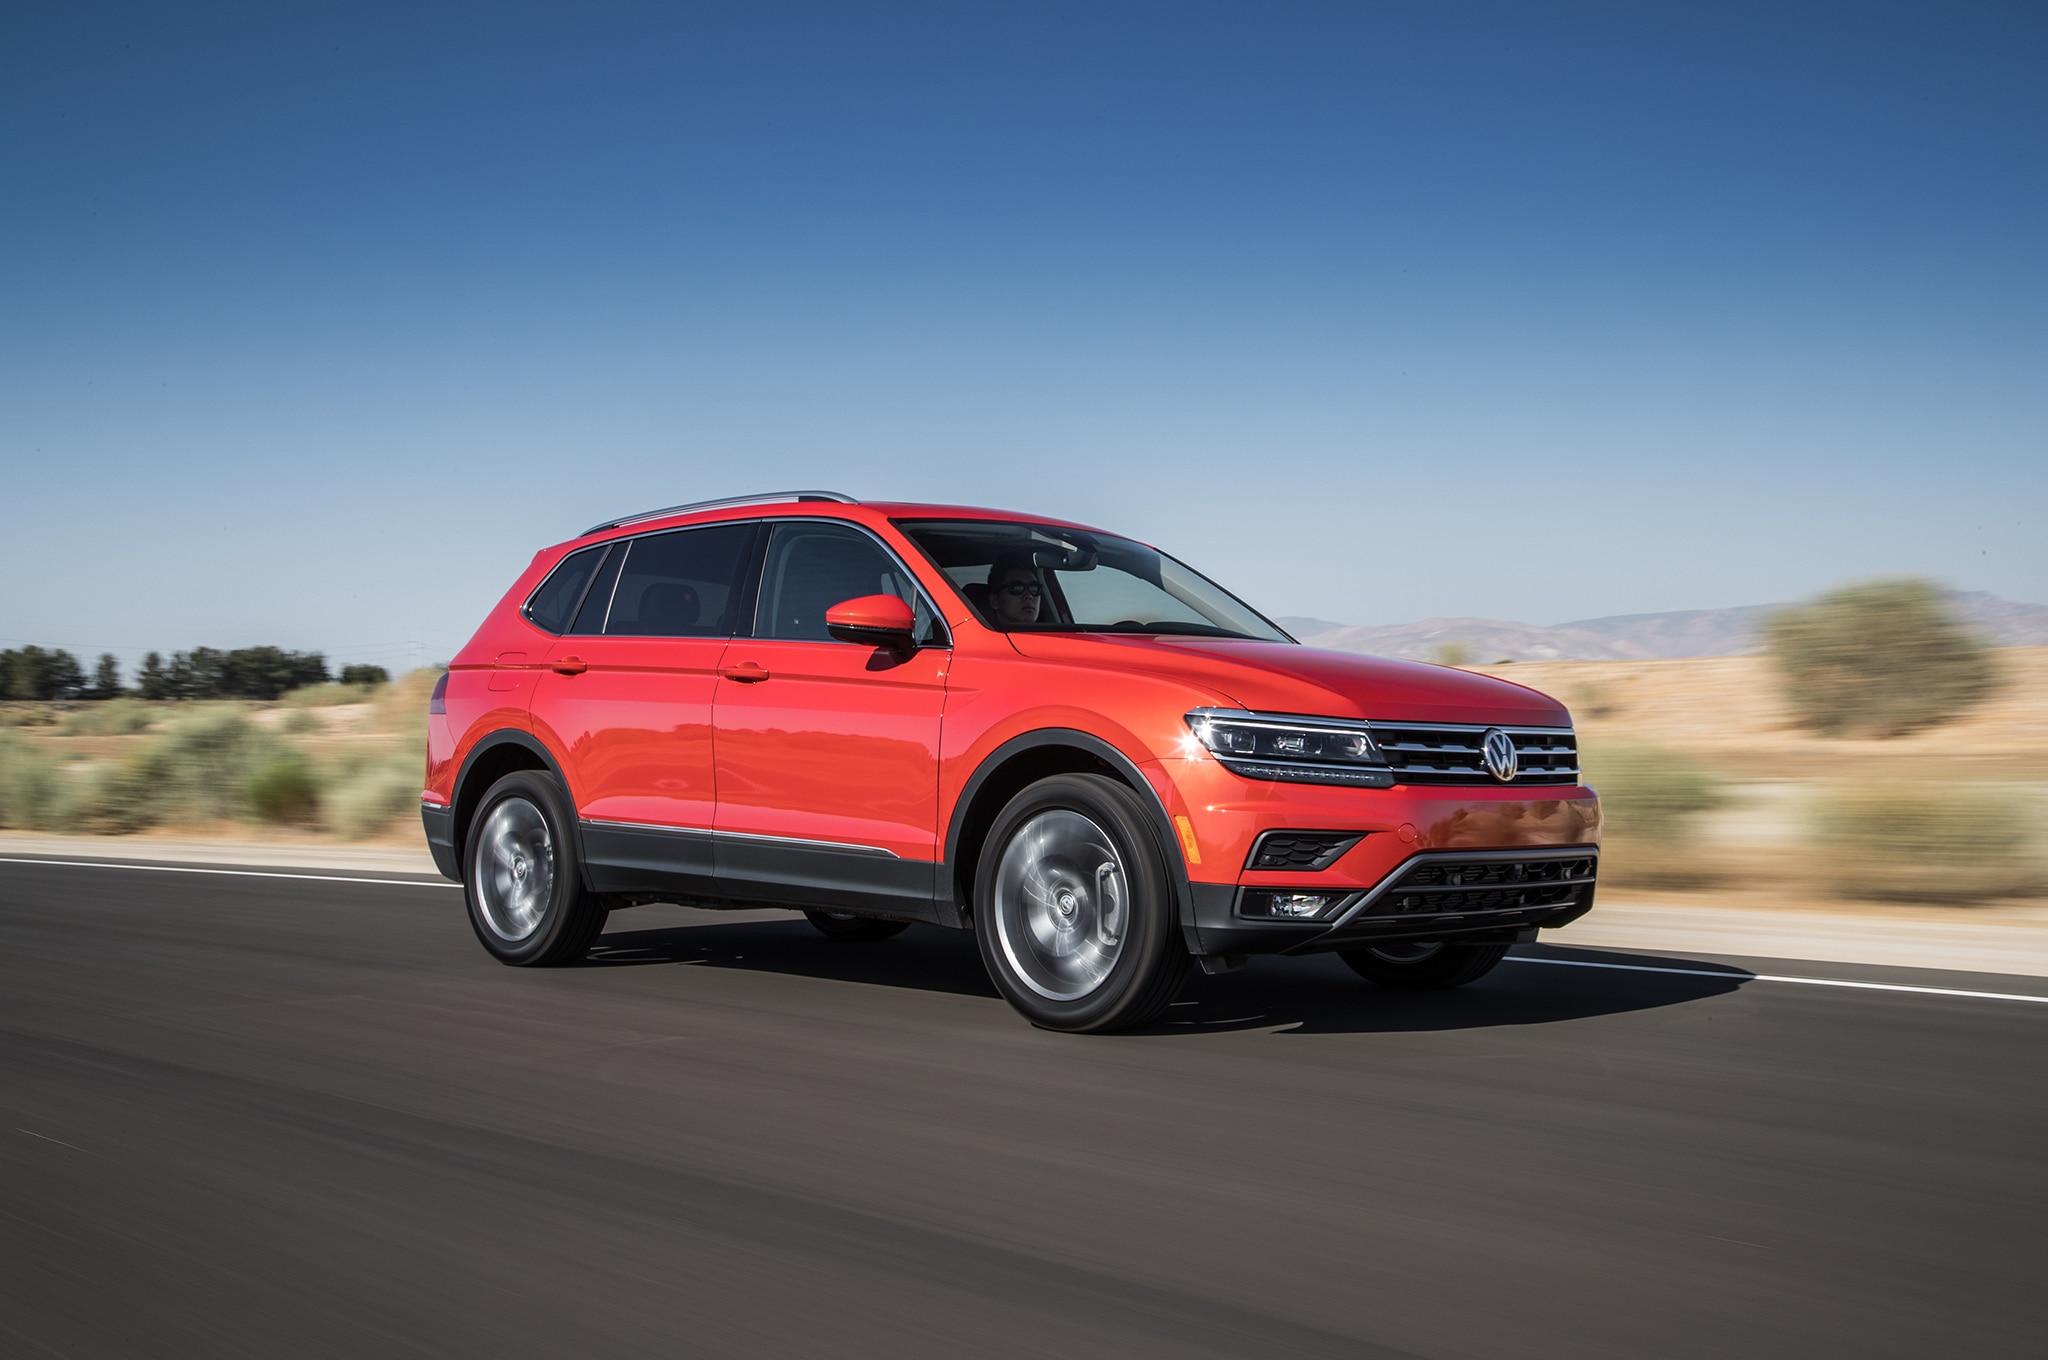 2018 Volkswagen Tiguan Front Three Quarter In Motion 01